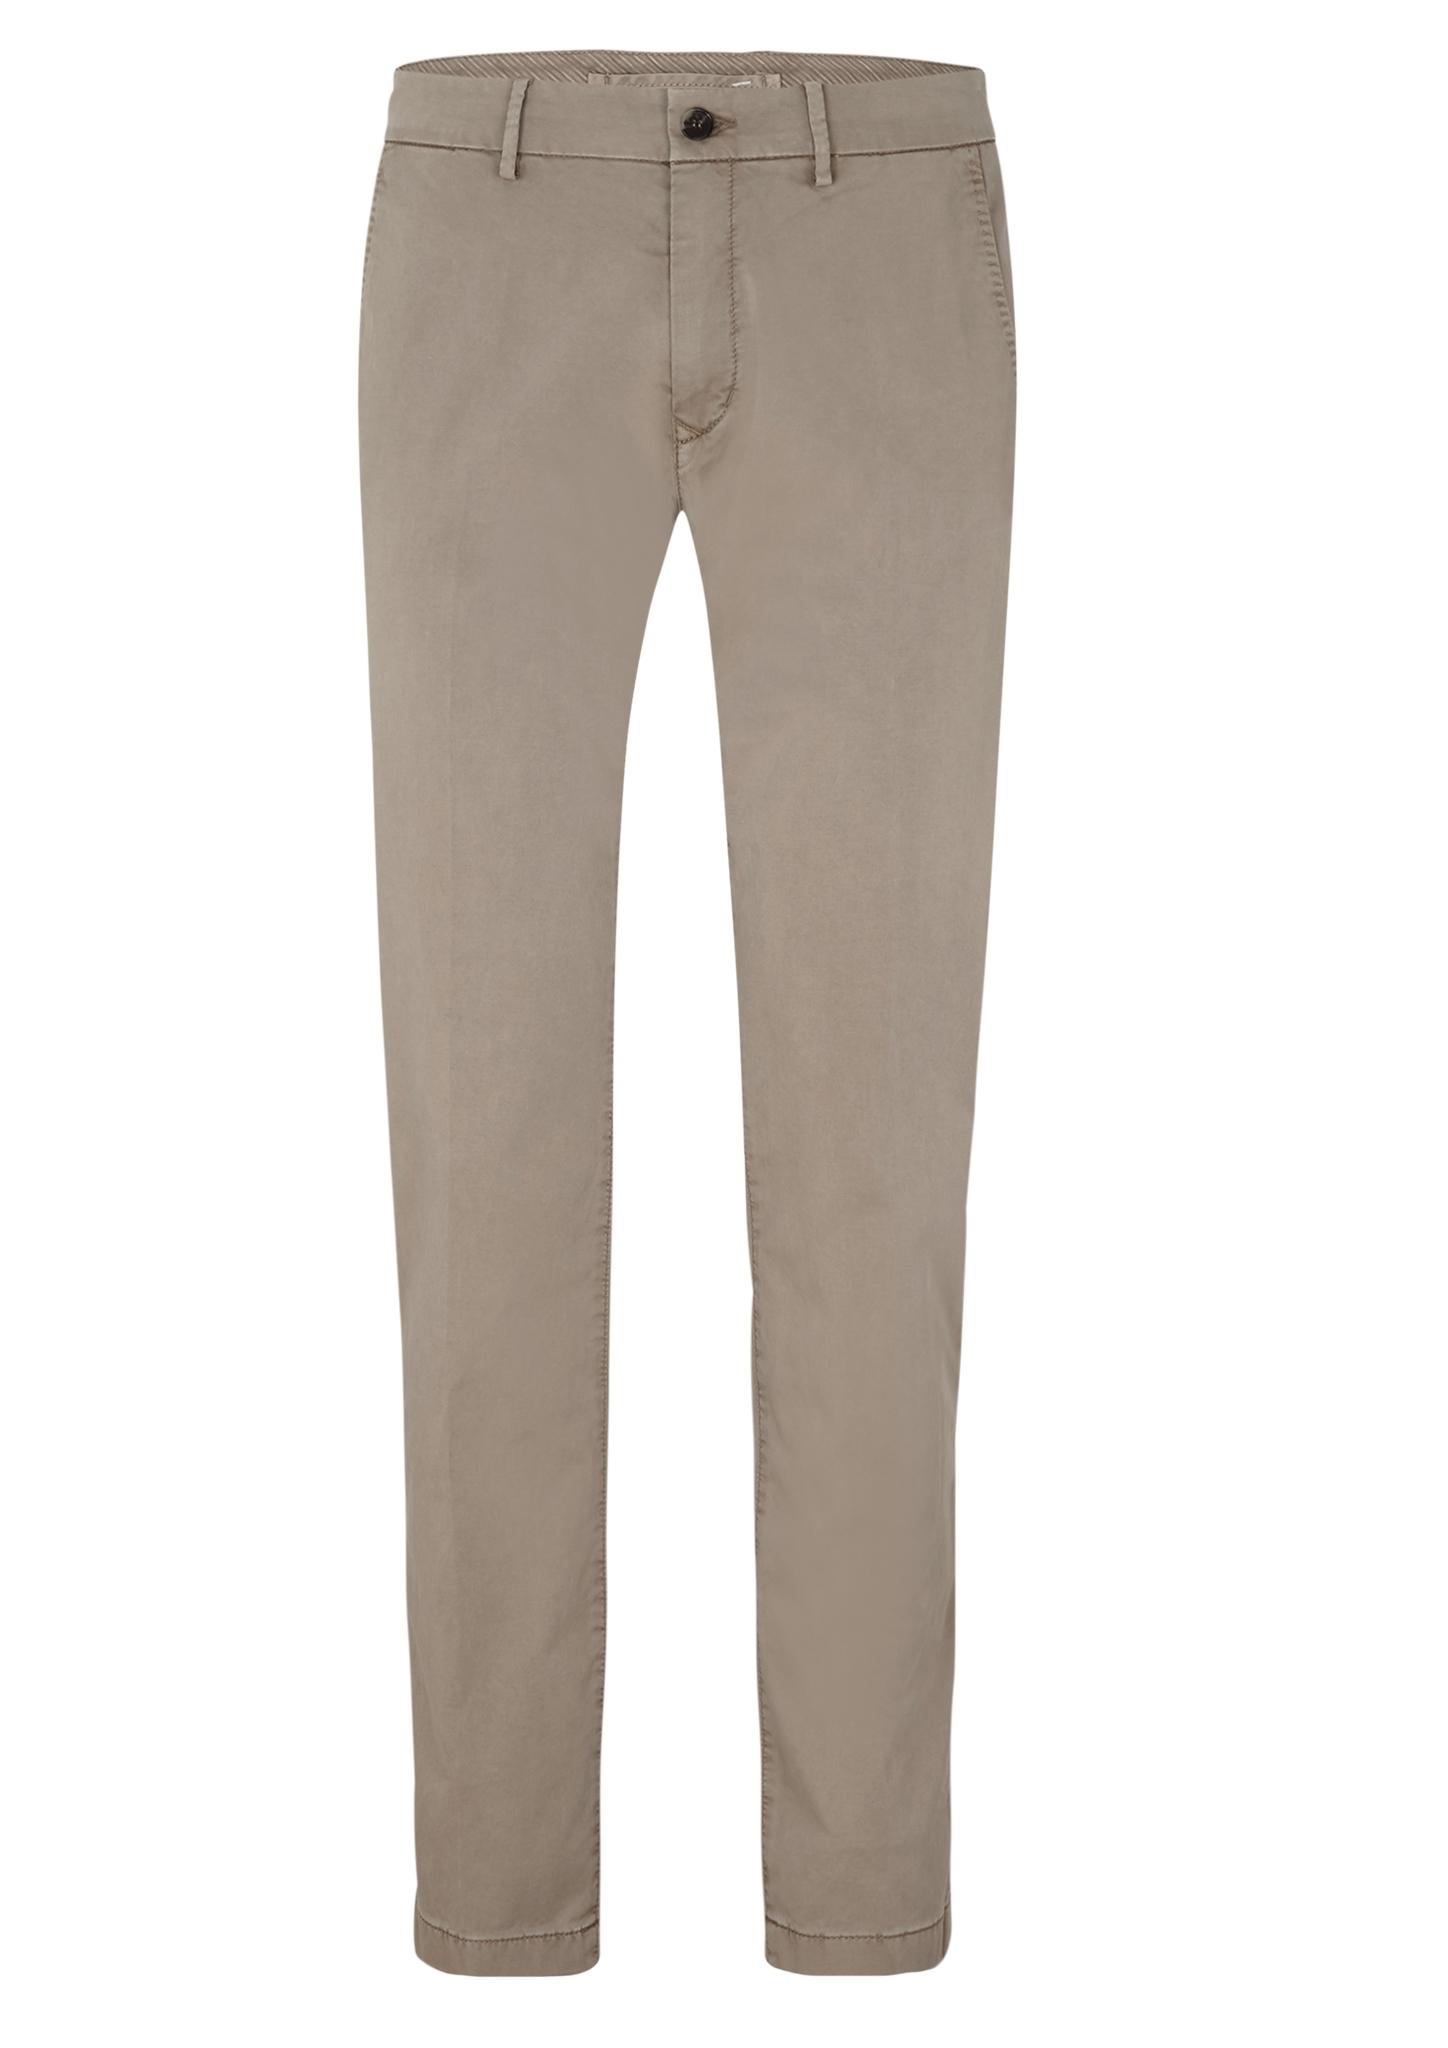 Chino | Bekleidung | Braun | Obermaterial 97% baumwolle -  3% elasthan| futter 100% baumwolle | s.Oliver BLACK LABEL